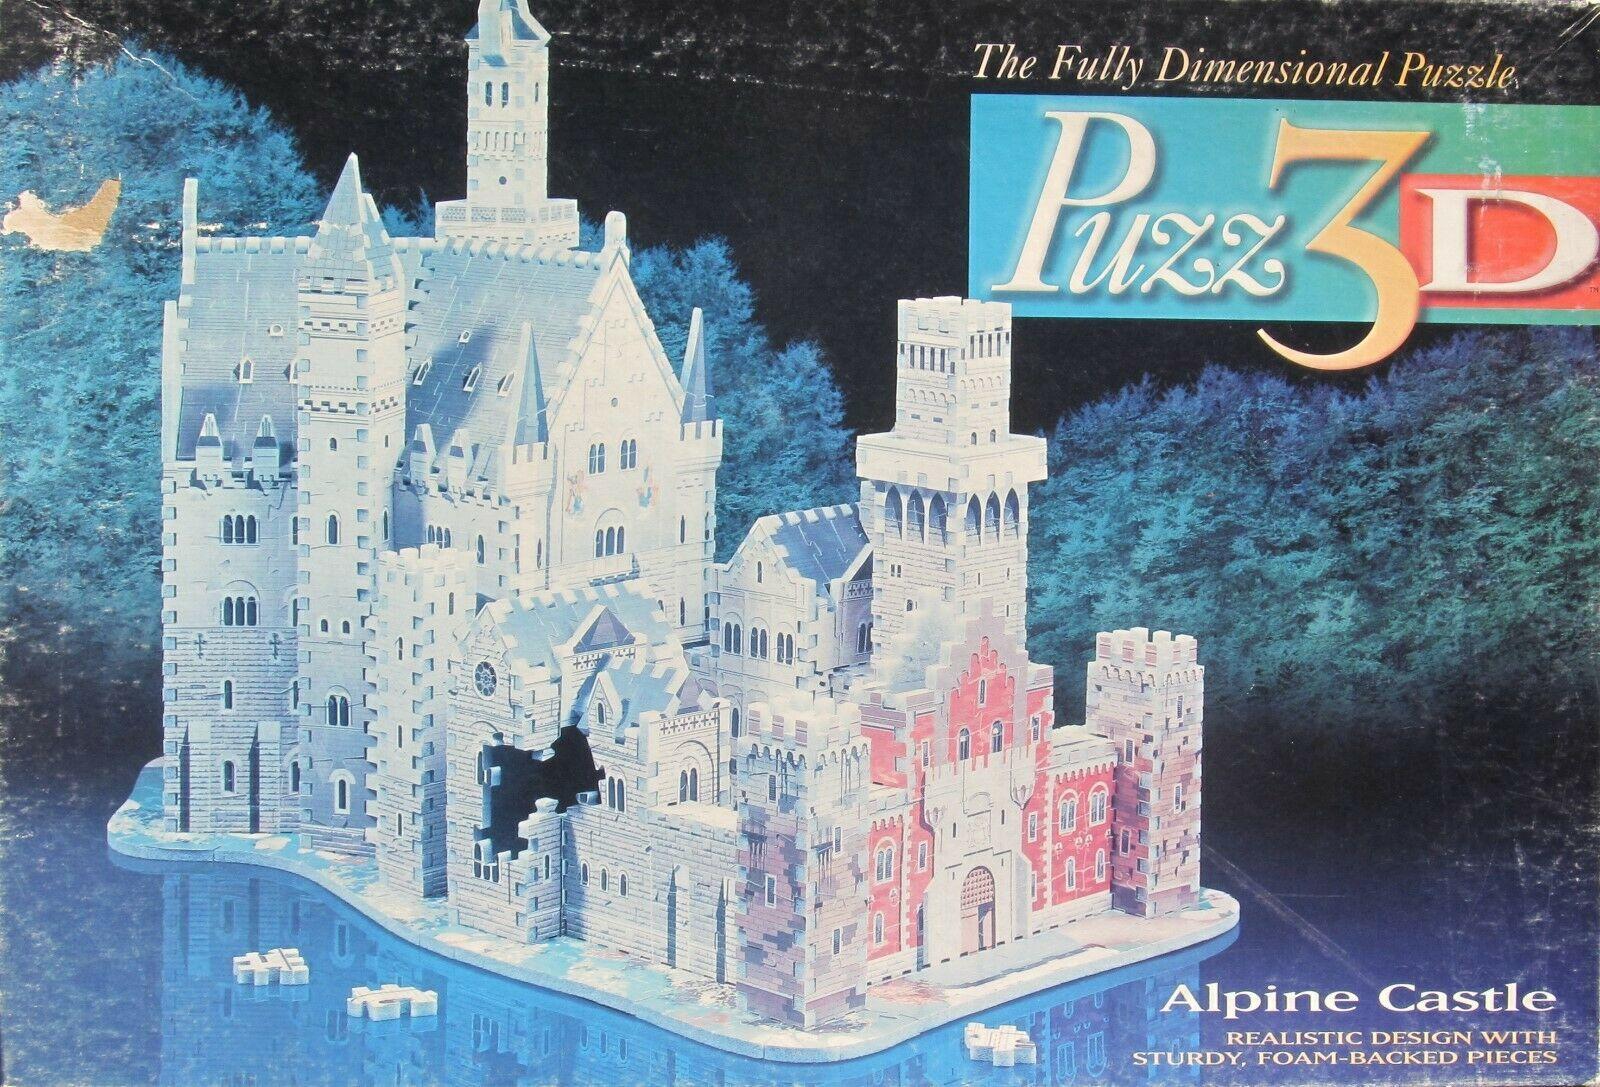 NEW Puzzlebug 500 Piece Jigsaw Puzzle ~ CANDY SWIRLS